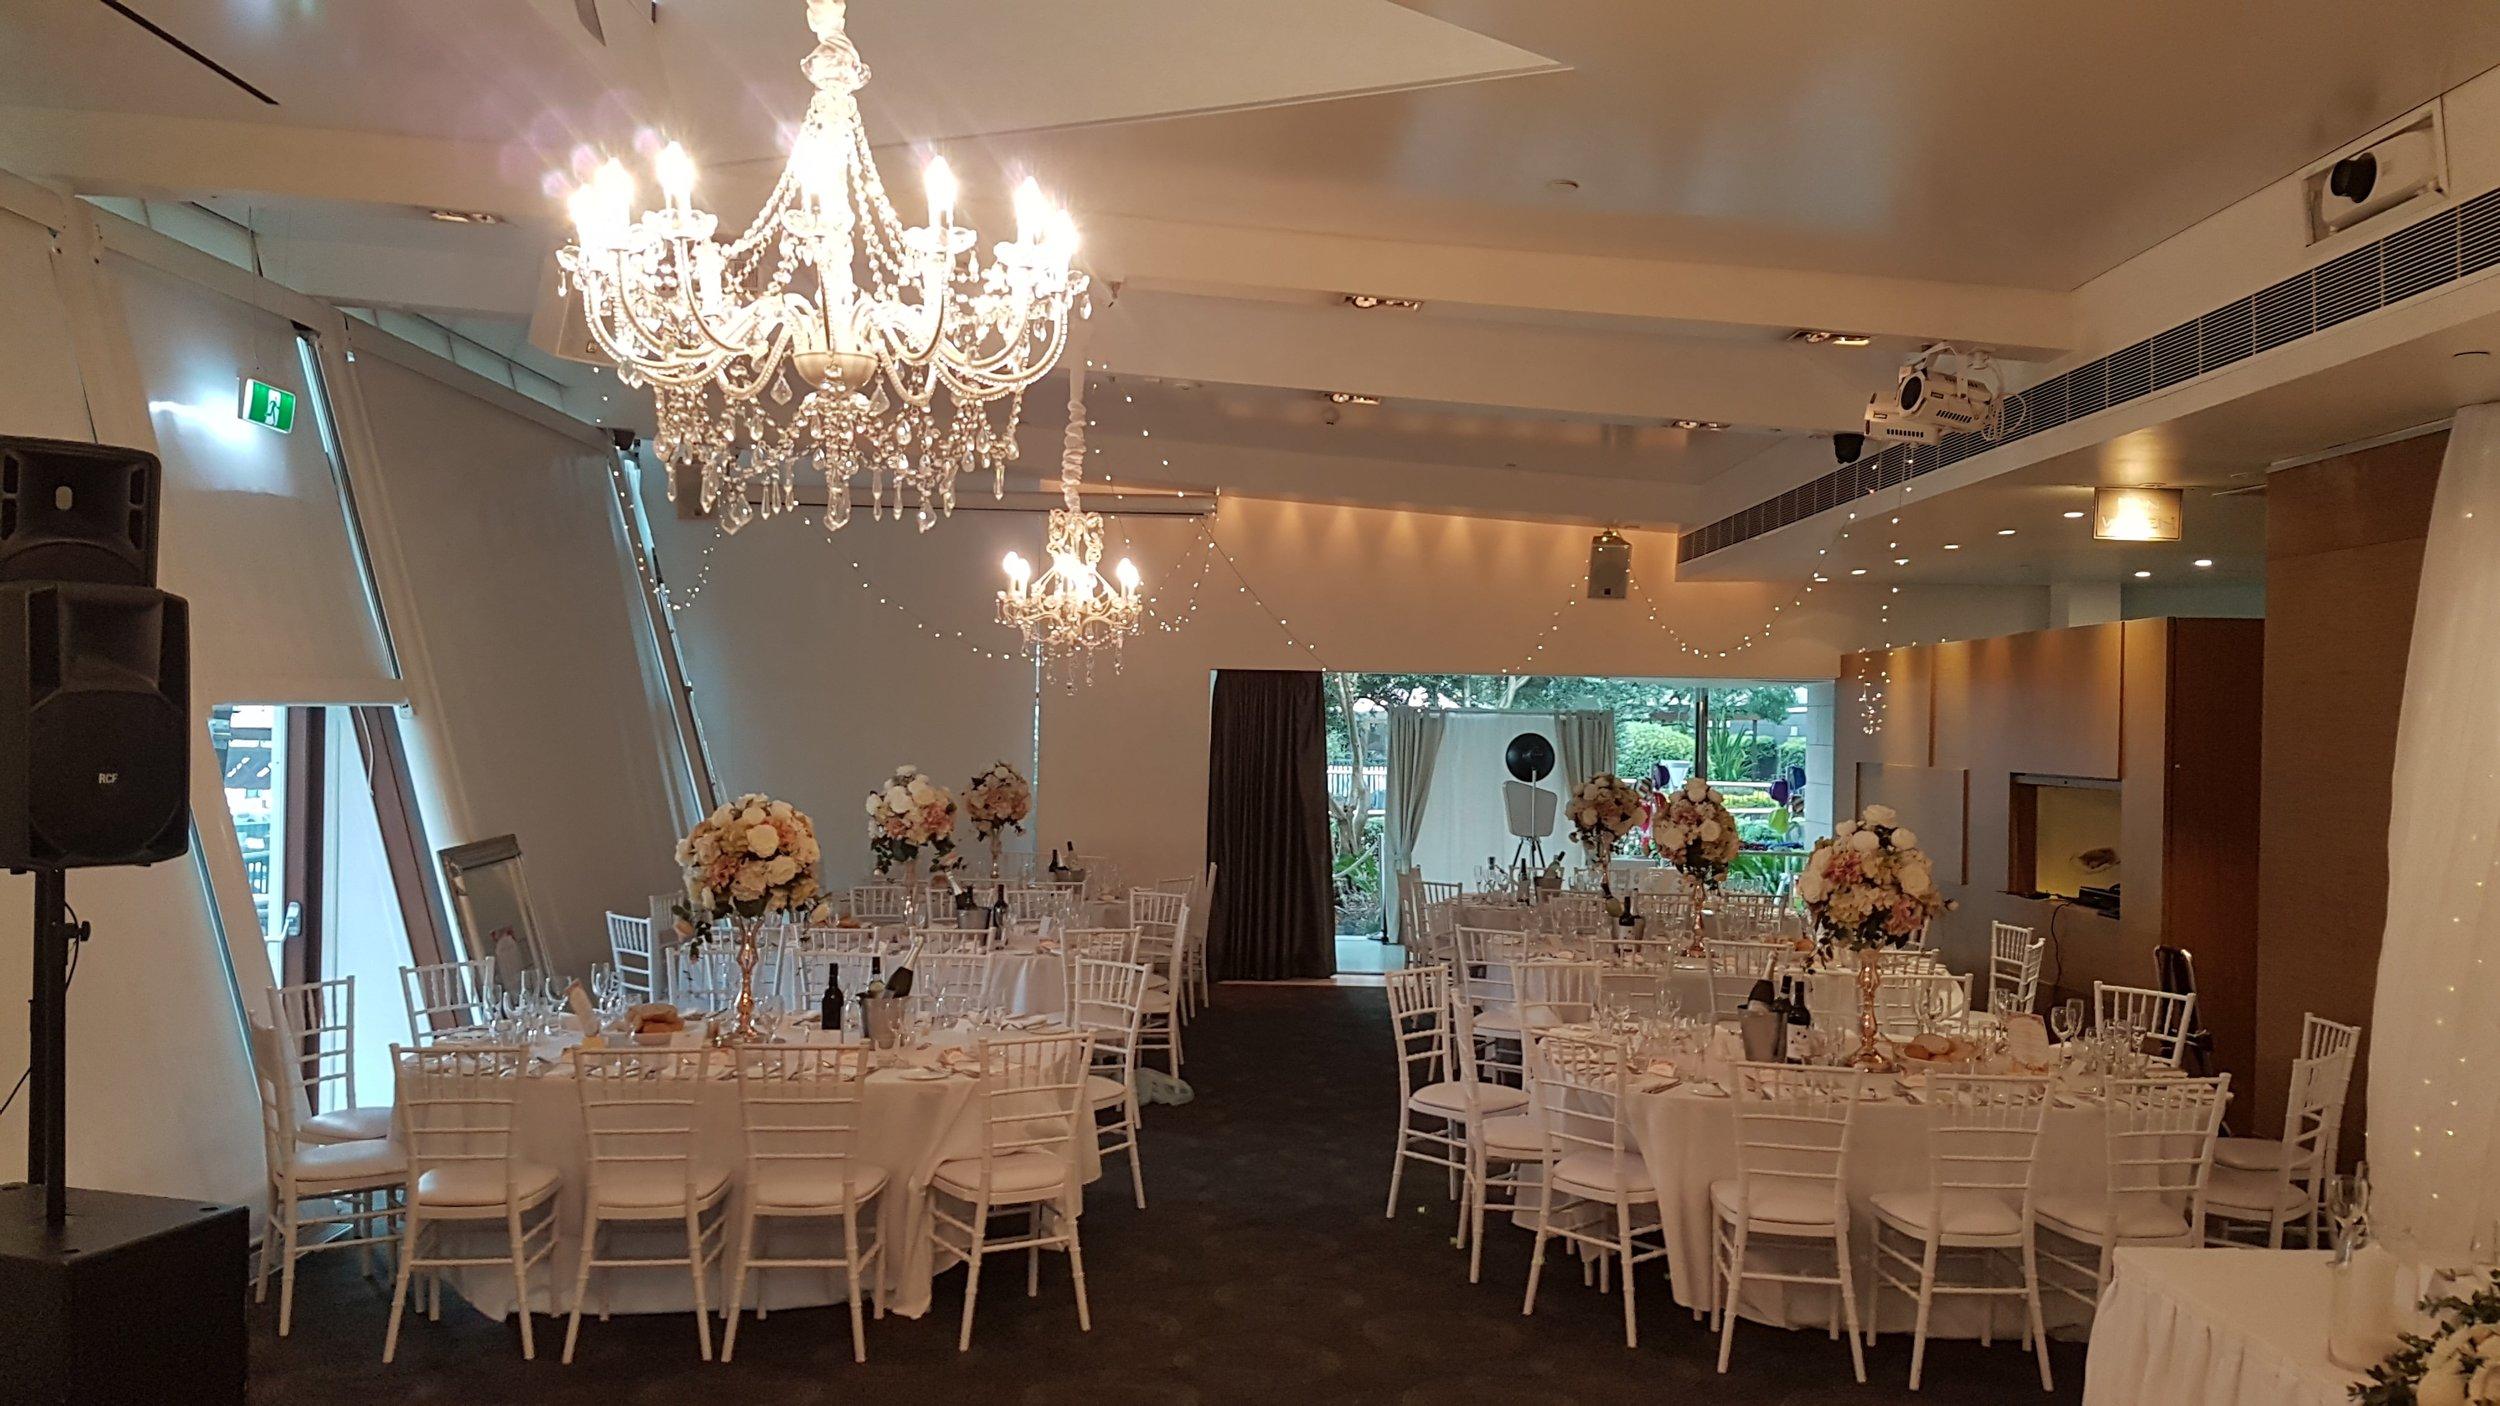 12 arm crystal chandelier with 6arm chandelier and fairylights @ L'Aqua Terrace room sydney  http://docksidegroup.com.au/venues/laqua